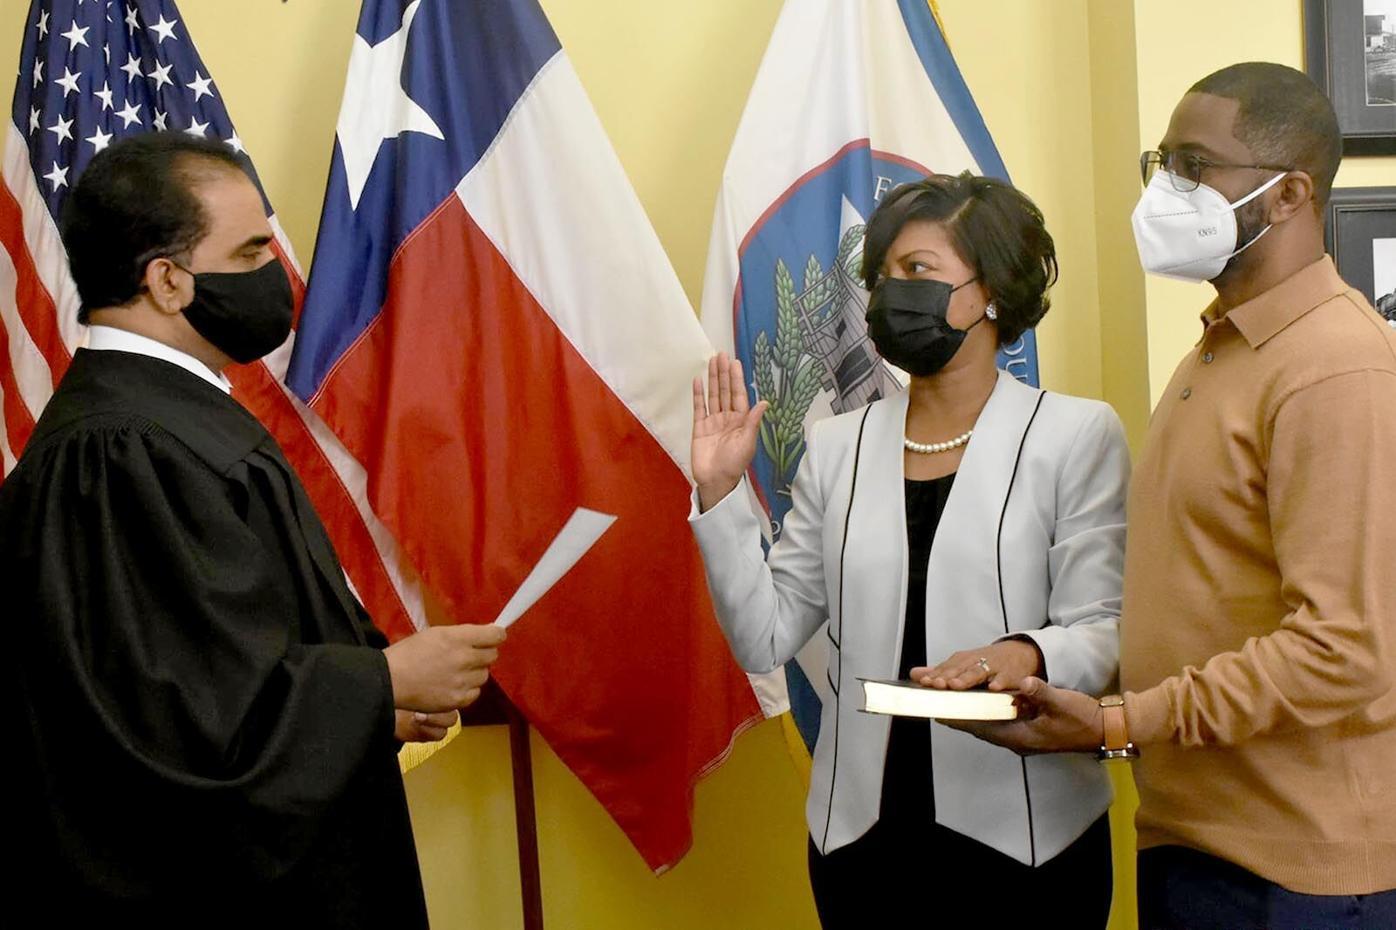 Judge KP George & Judge LaTosha McGill Clayton